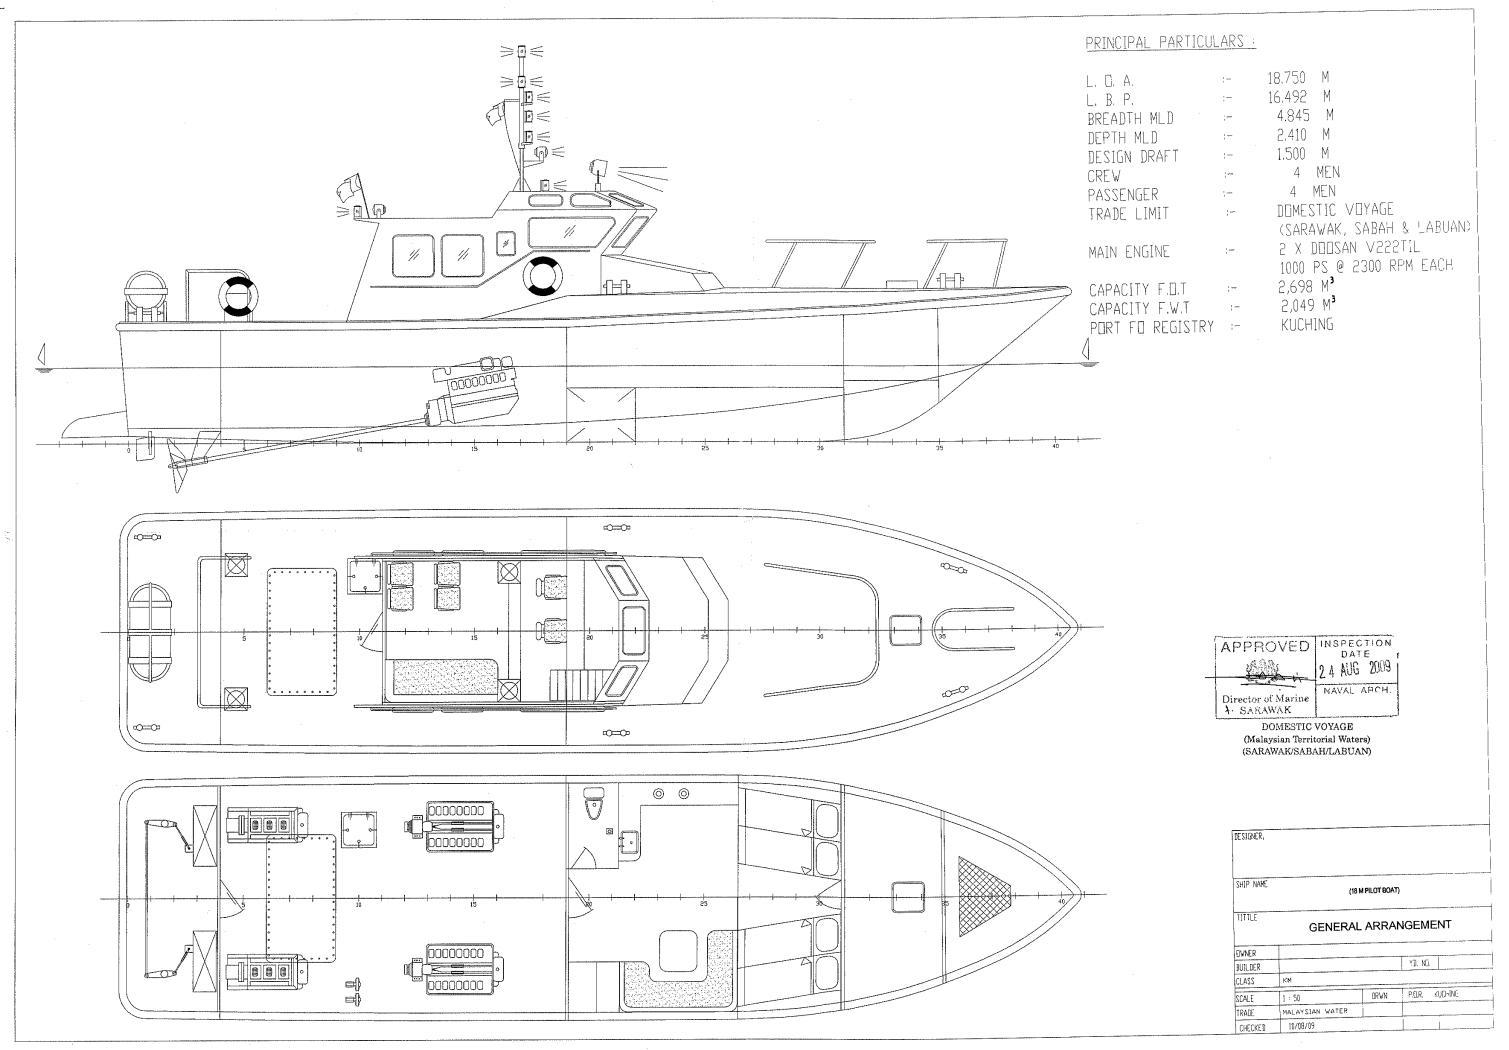 megalodon marine sdn bhd shipbuilding ship brokerage. Black Bedroom Furniture Sets. Home Design Ideas